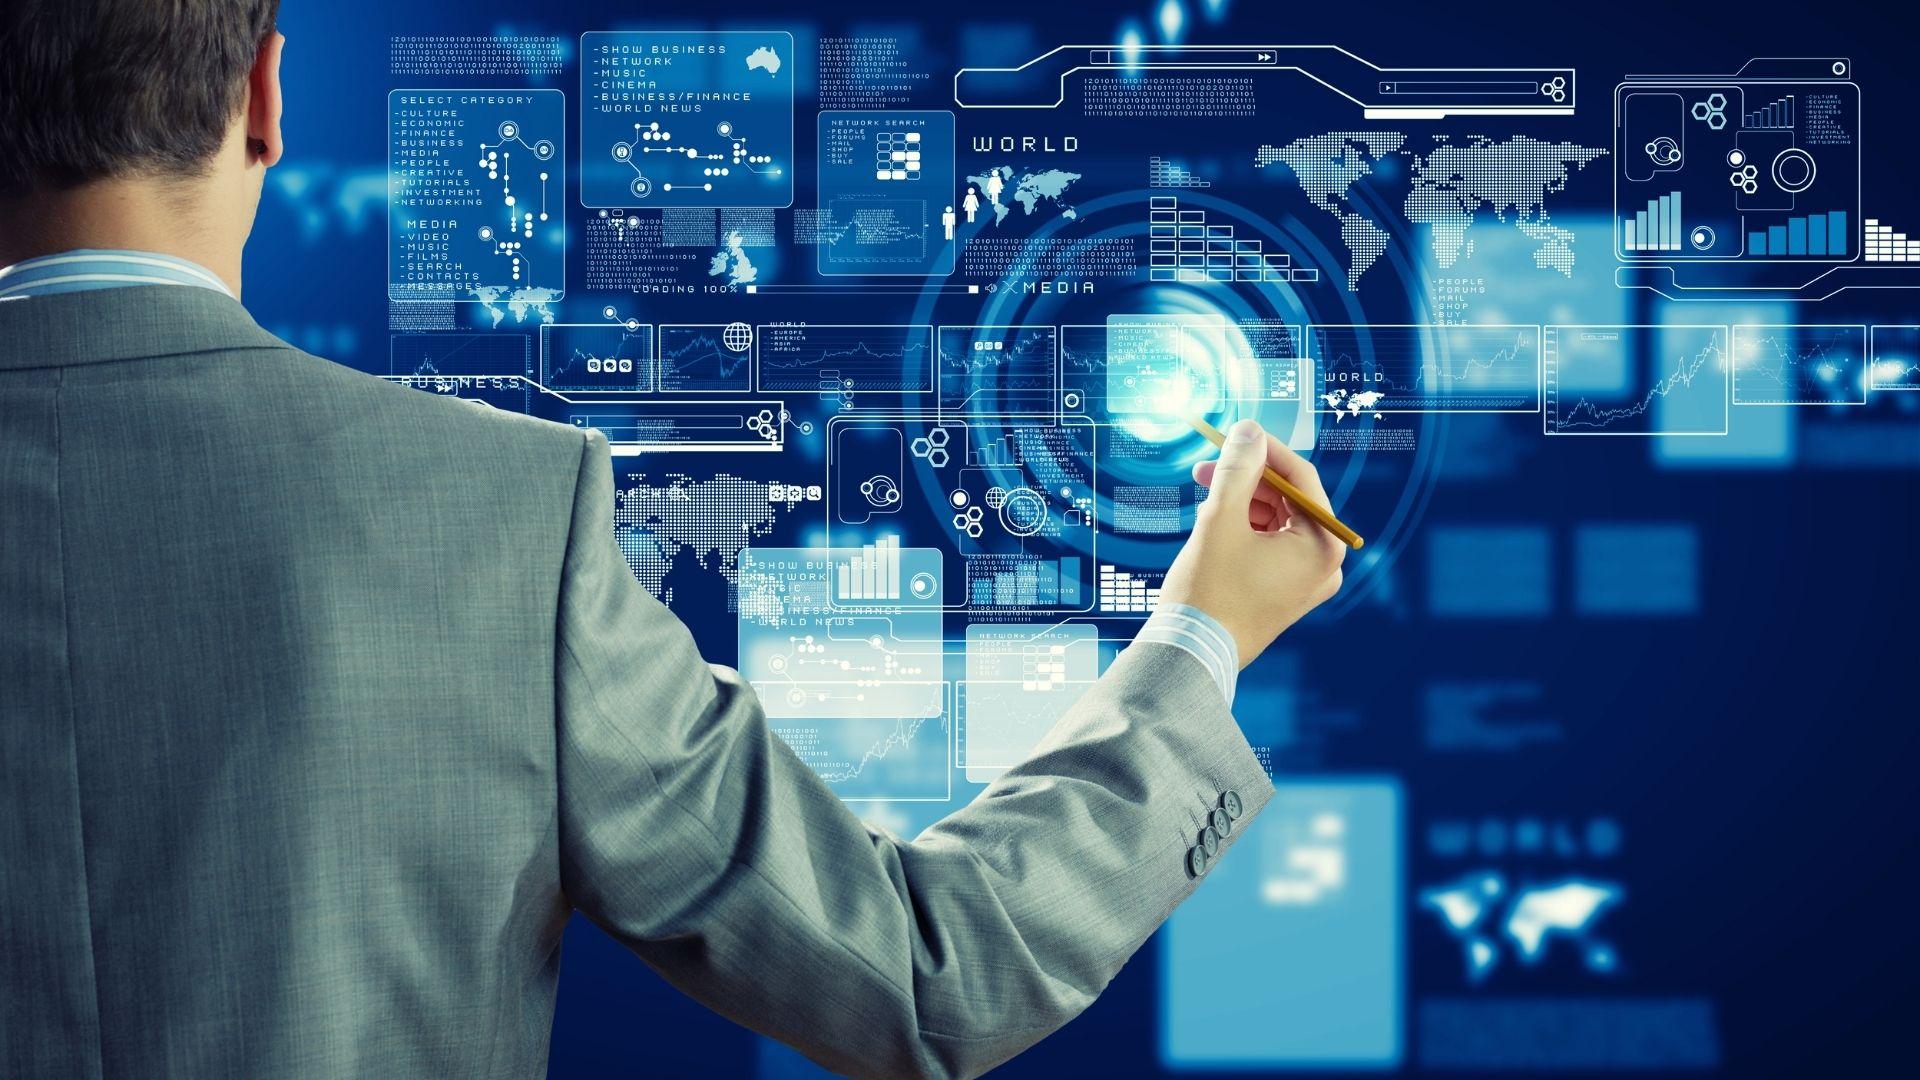 Banca Popolare di Sondrio drives digital innovations in banking with Infovista's Ipanema SD-WAN 1